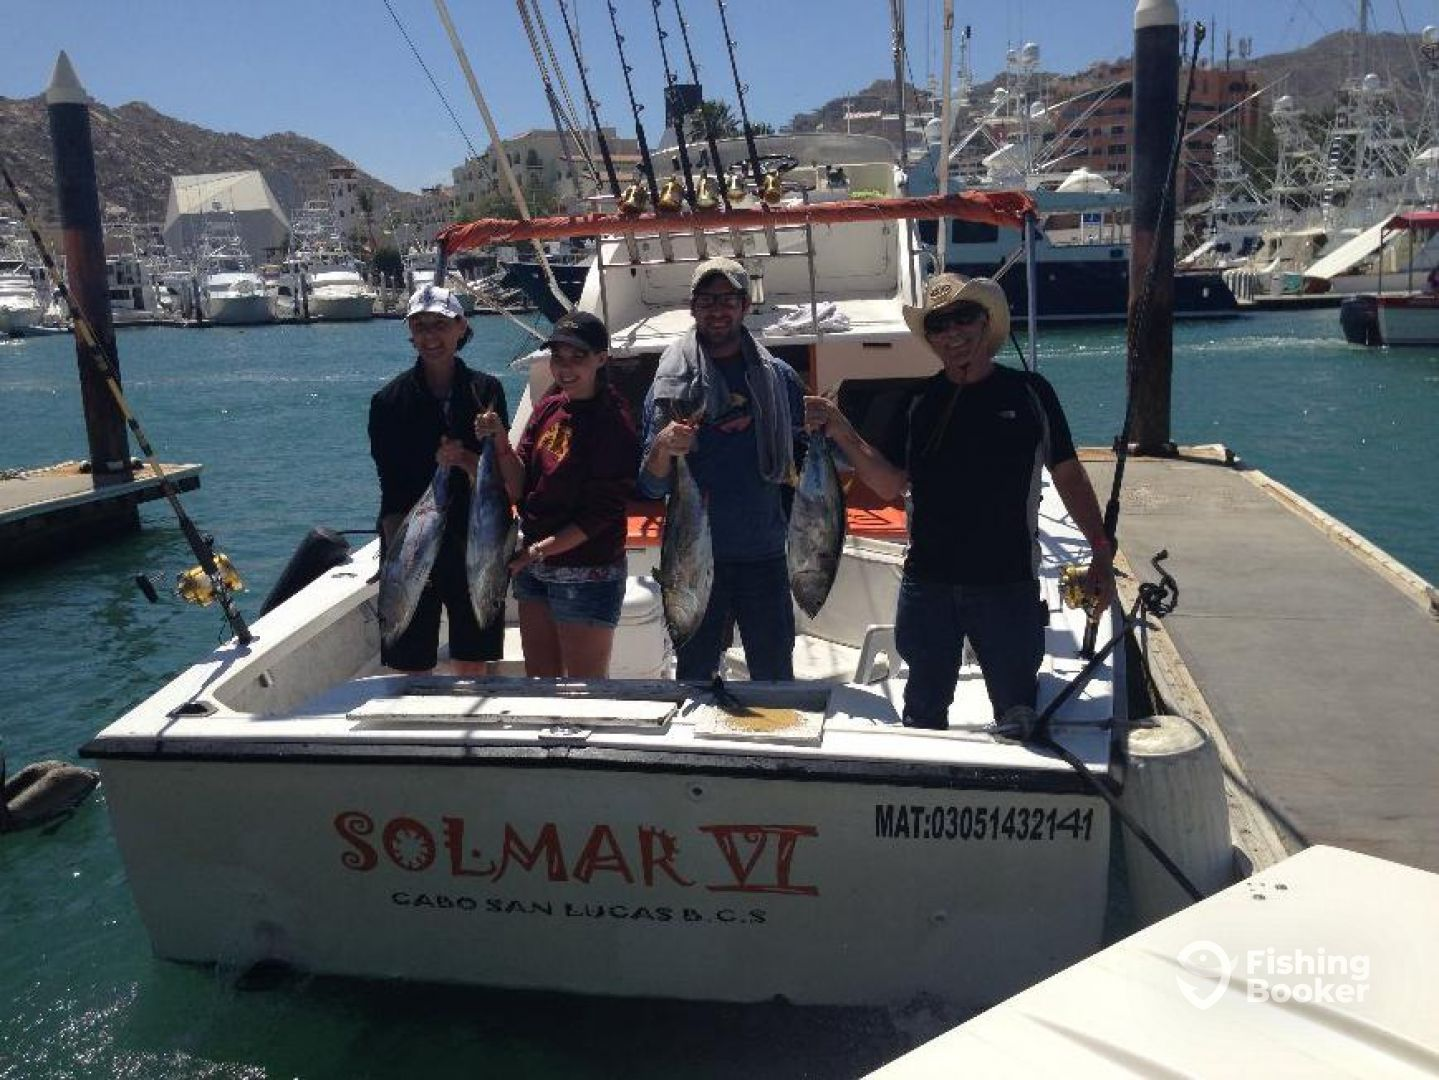 Solmar vi sportfishing 31 ft boat cabo san lucas mexico for Fishing cabo san lucas